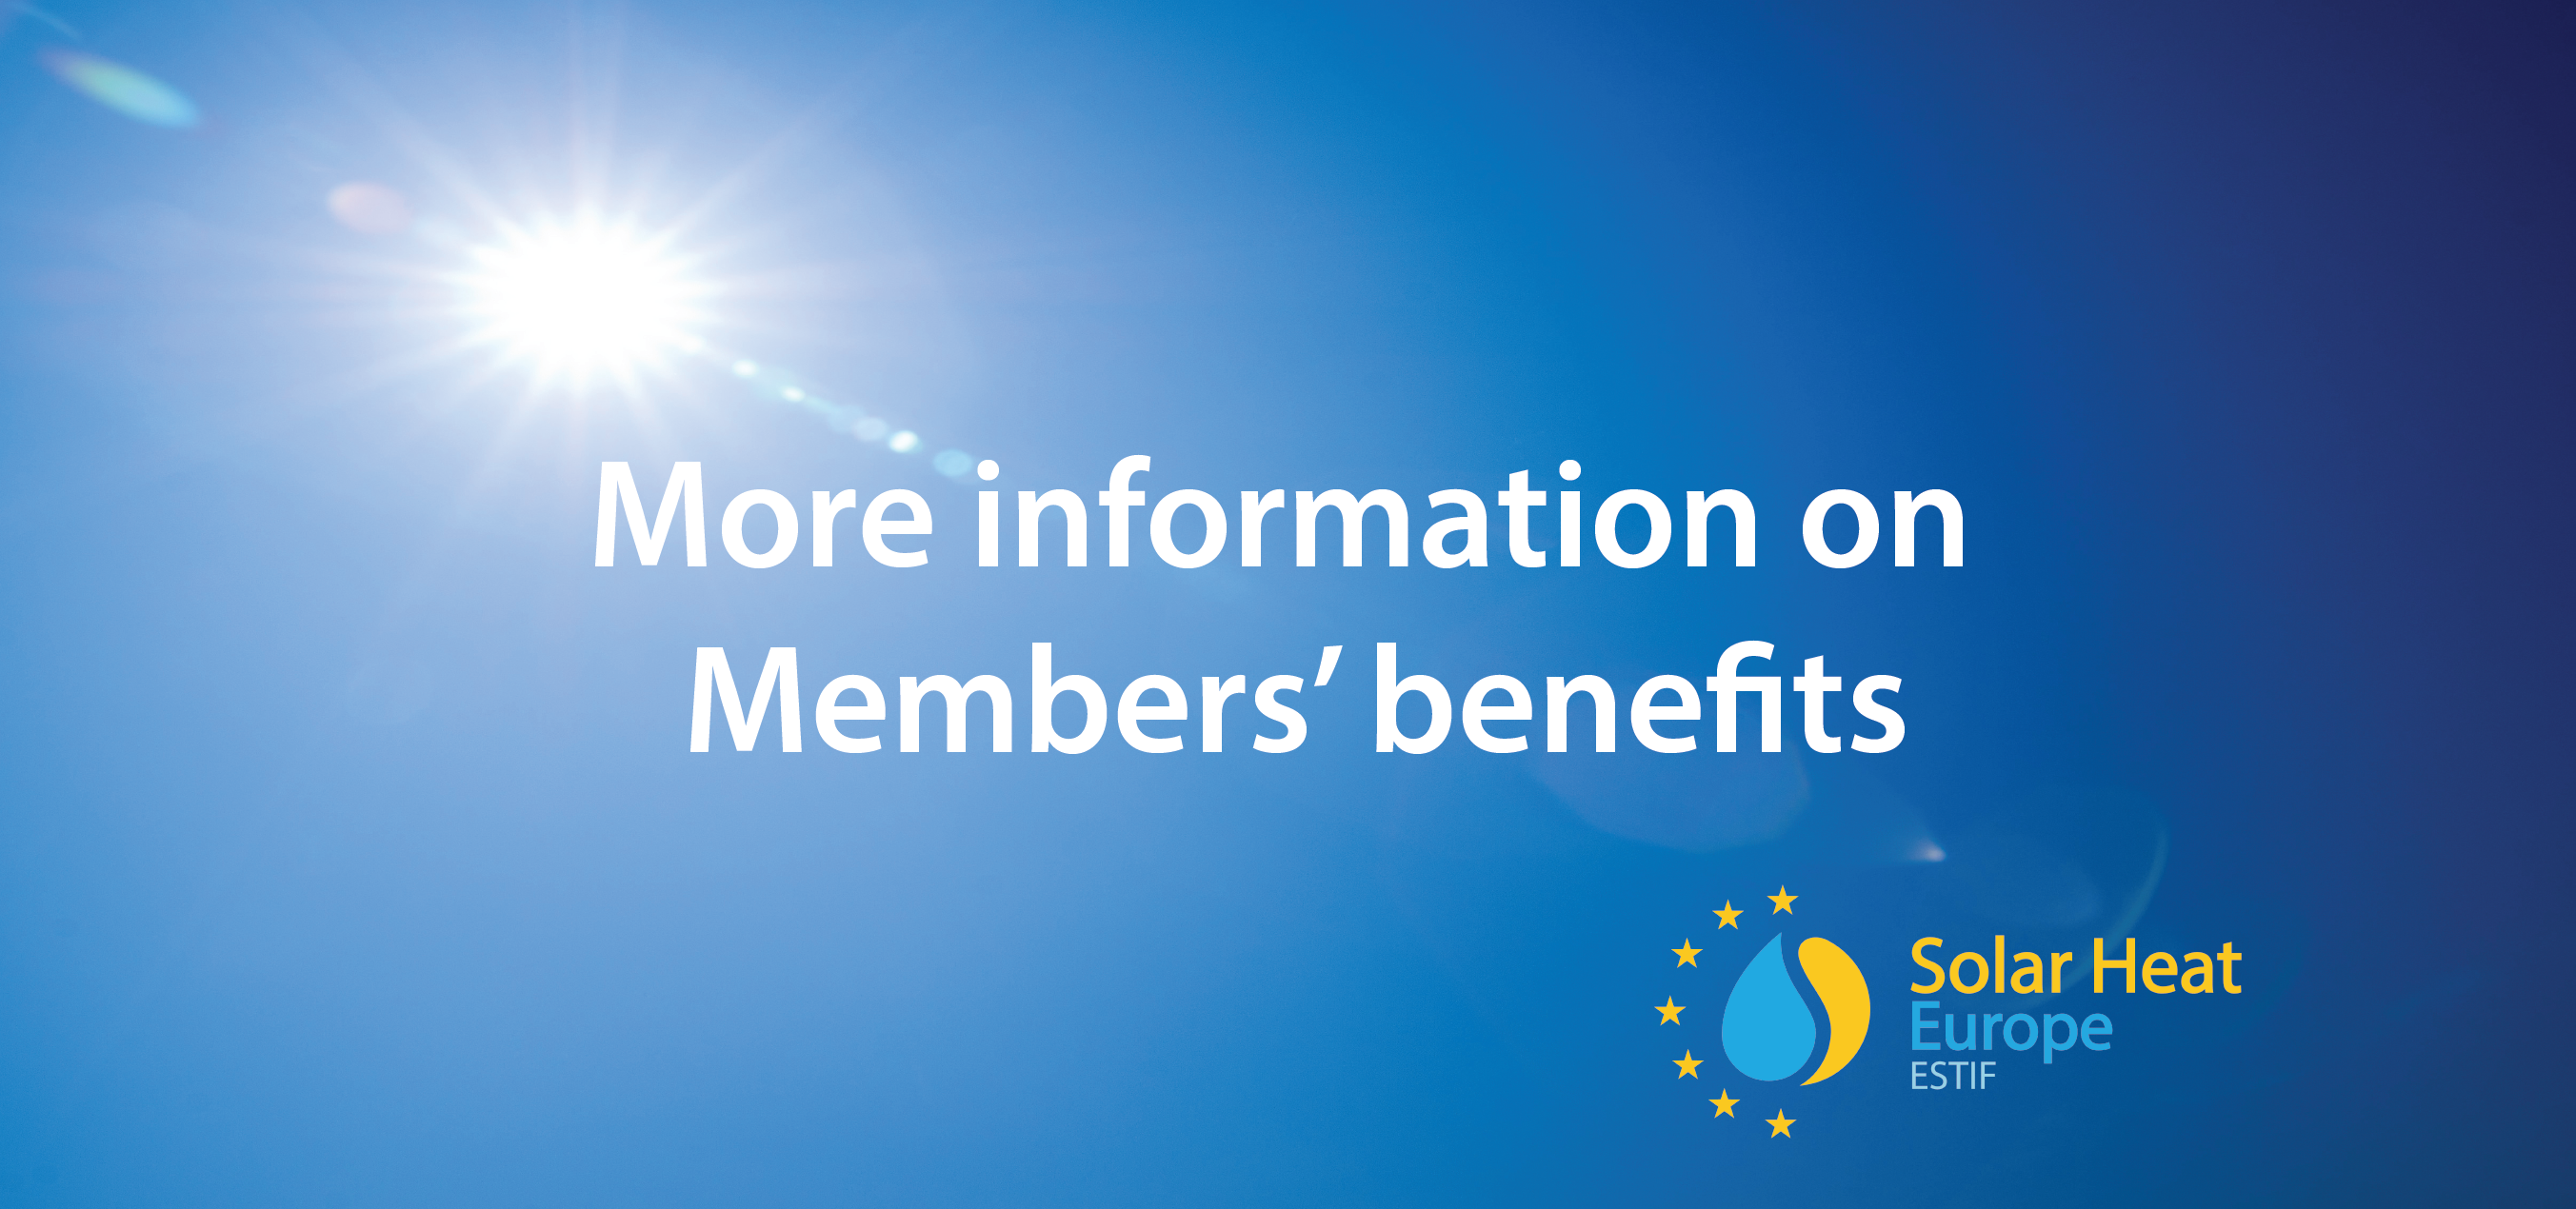 More information on Members' benefits – Second versin-01